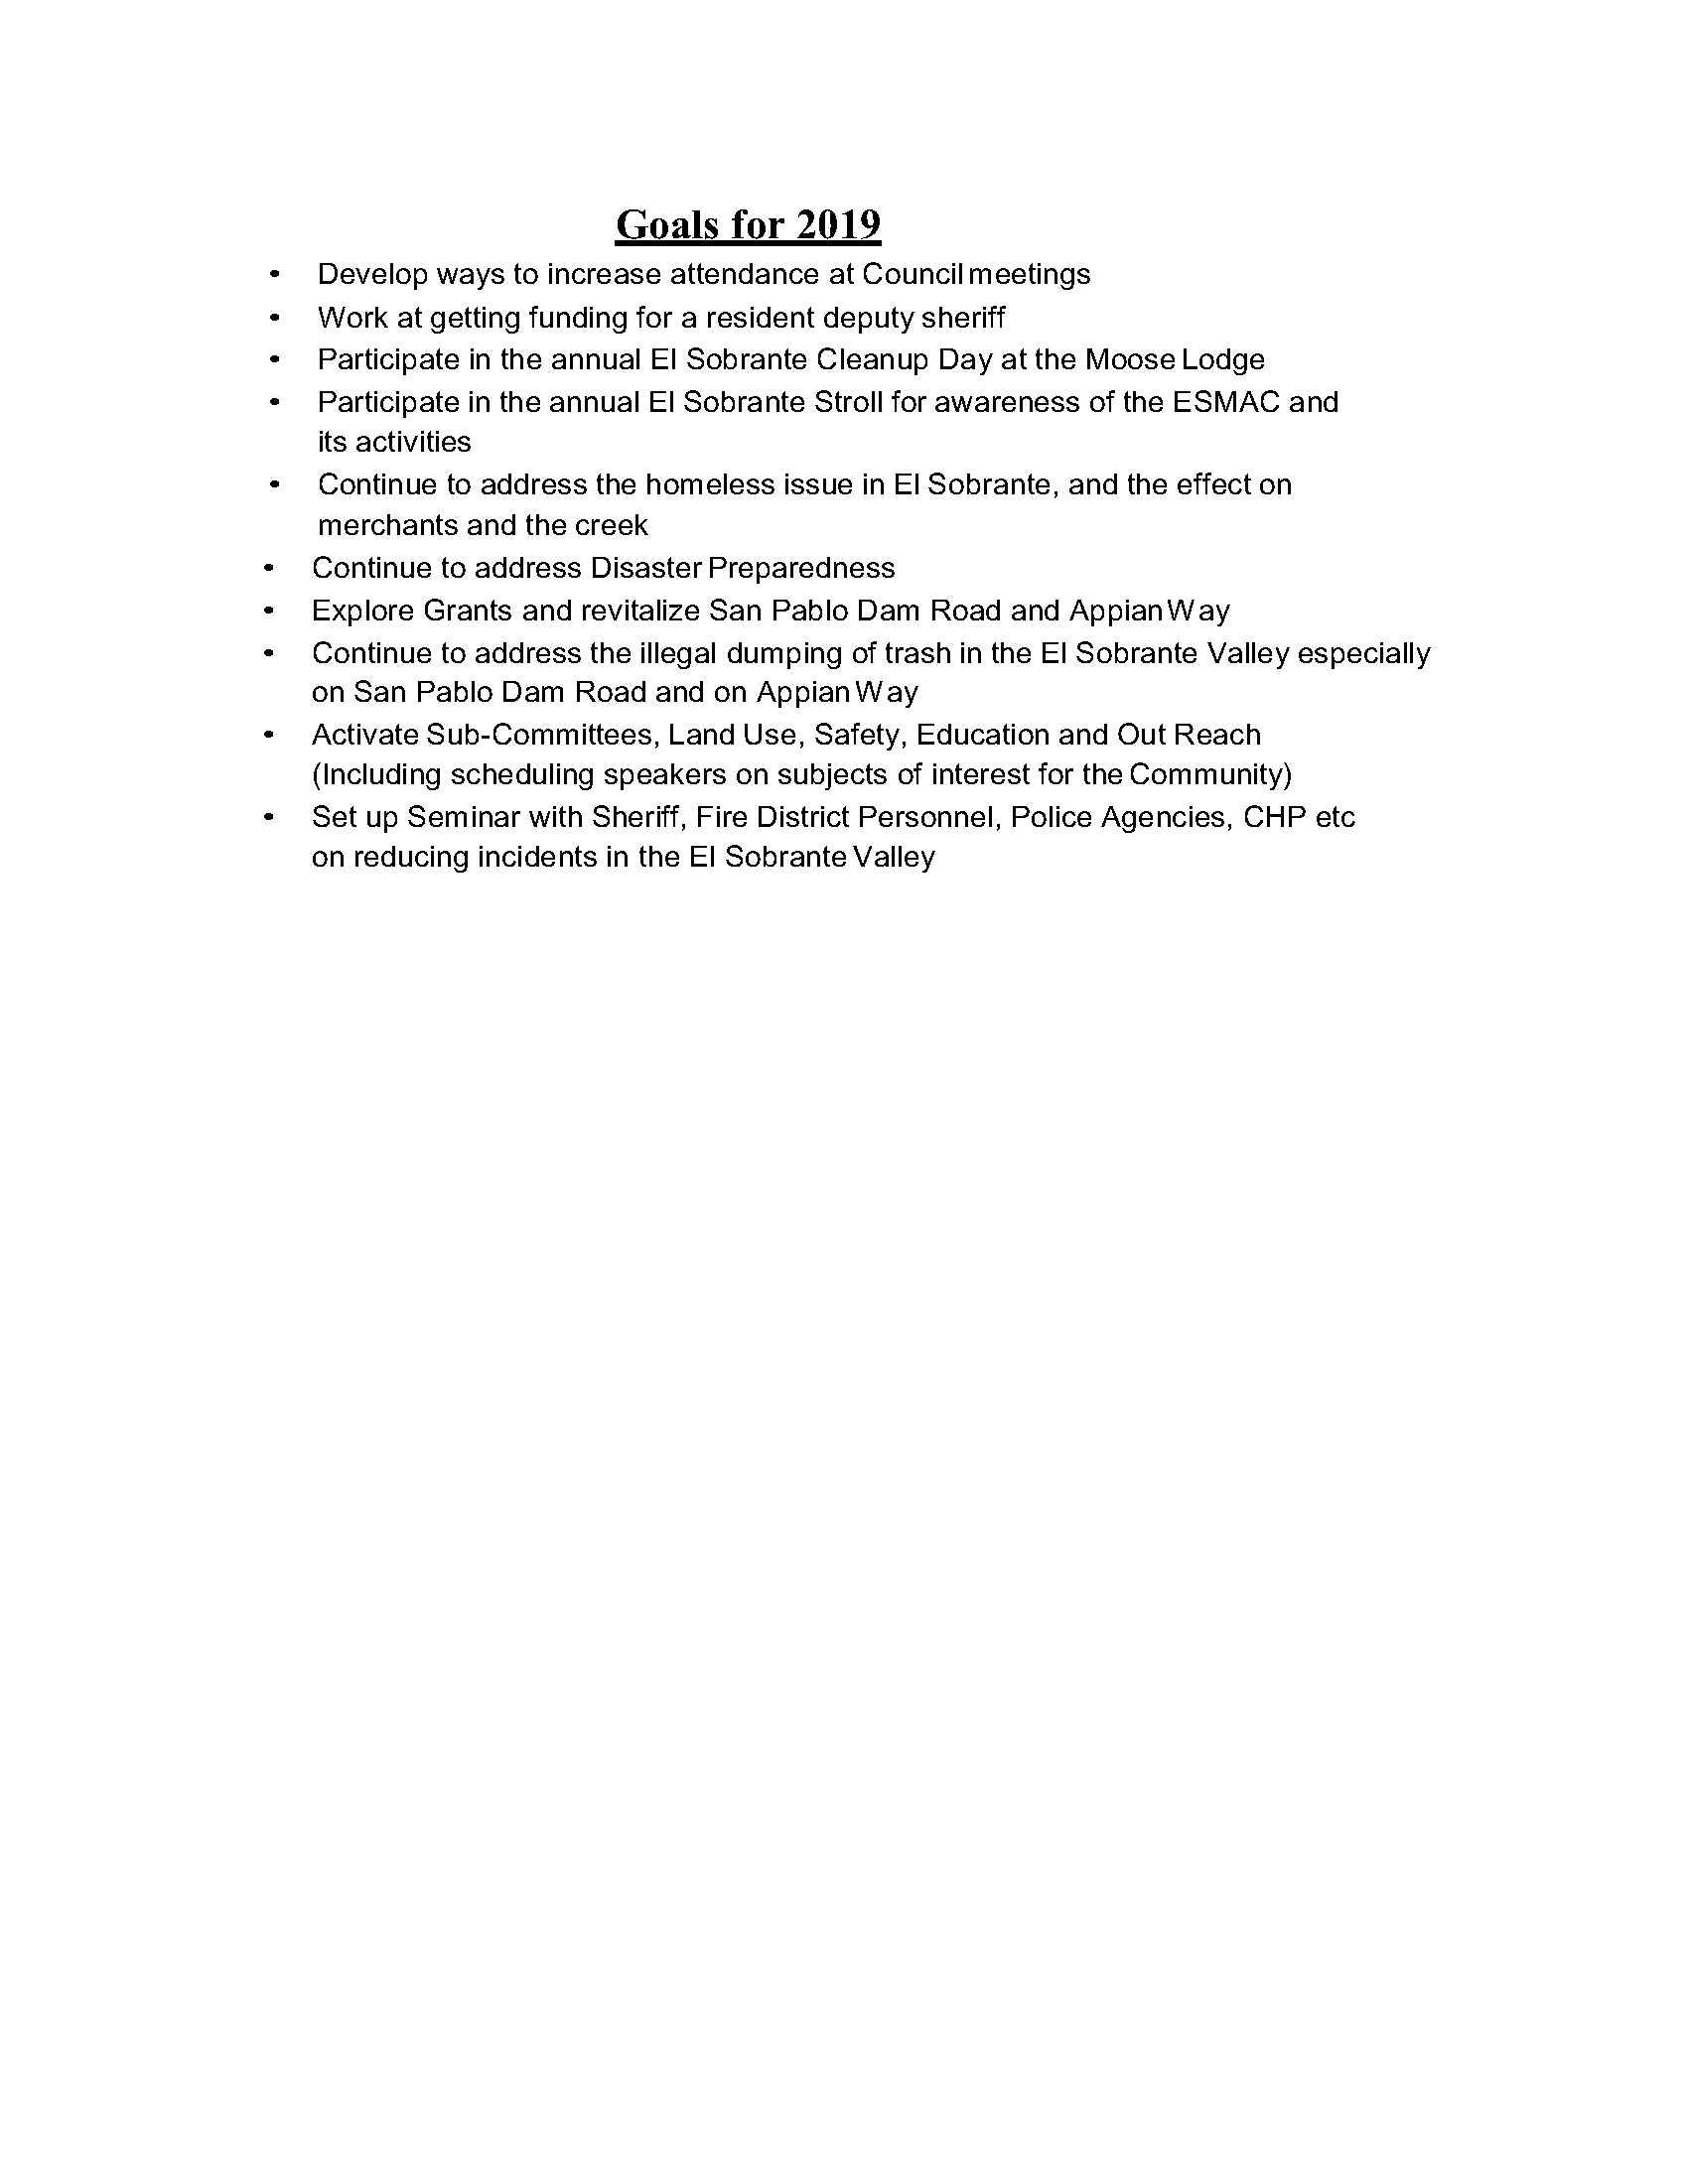 ESMAC Agenda 12.13.2018 (51 Pages)_25.jpg